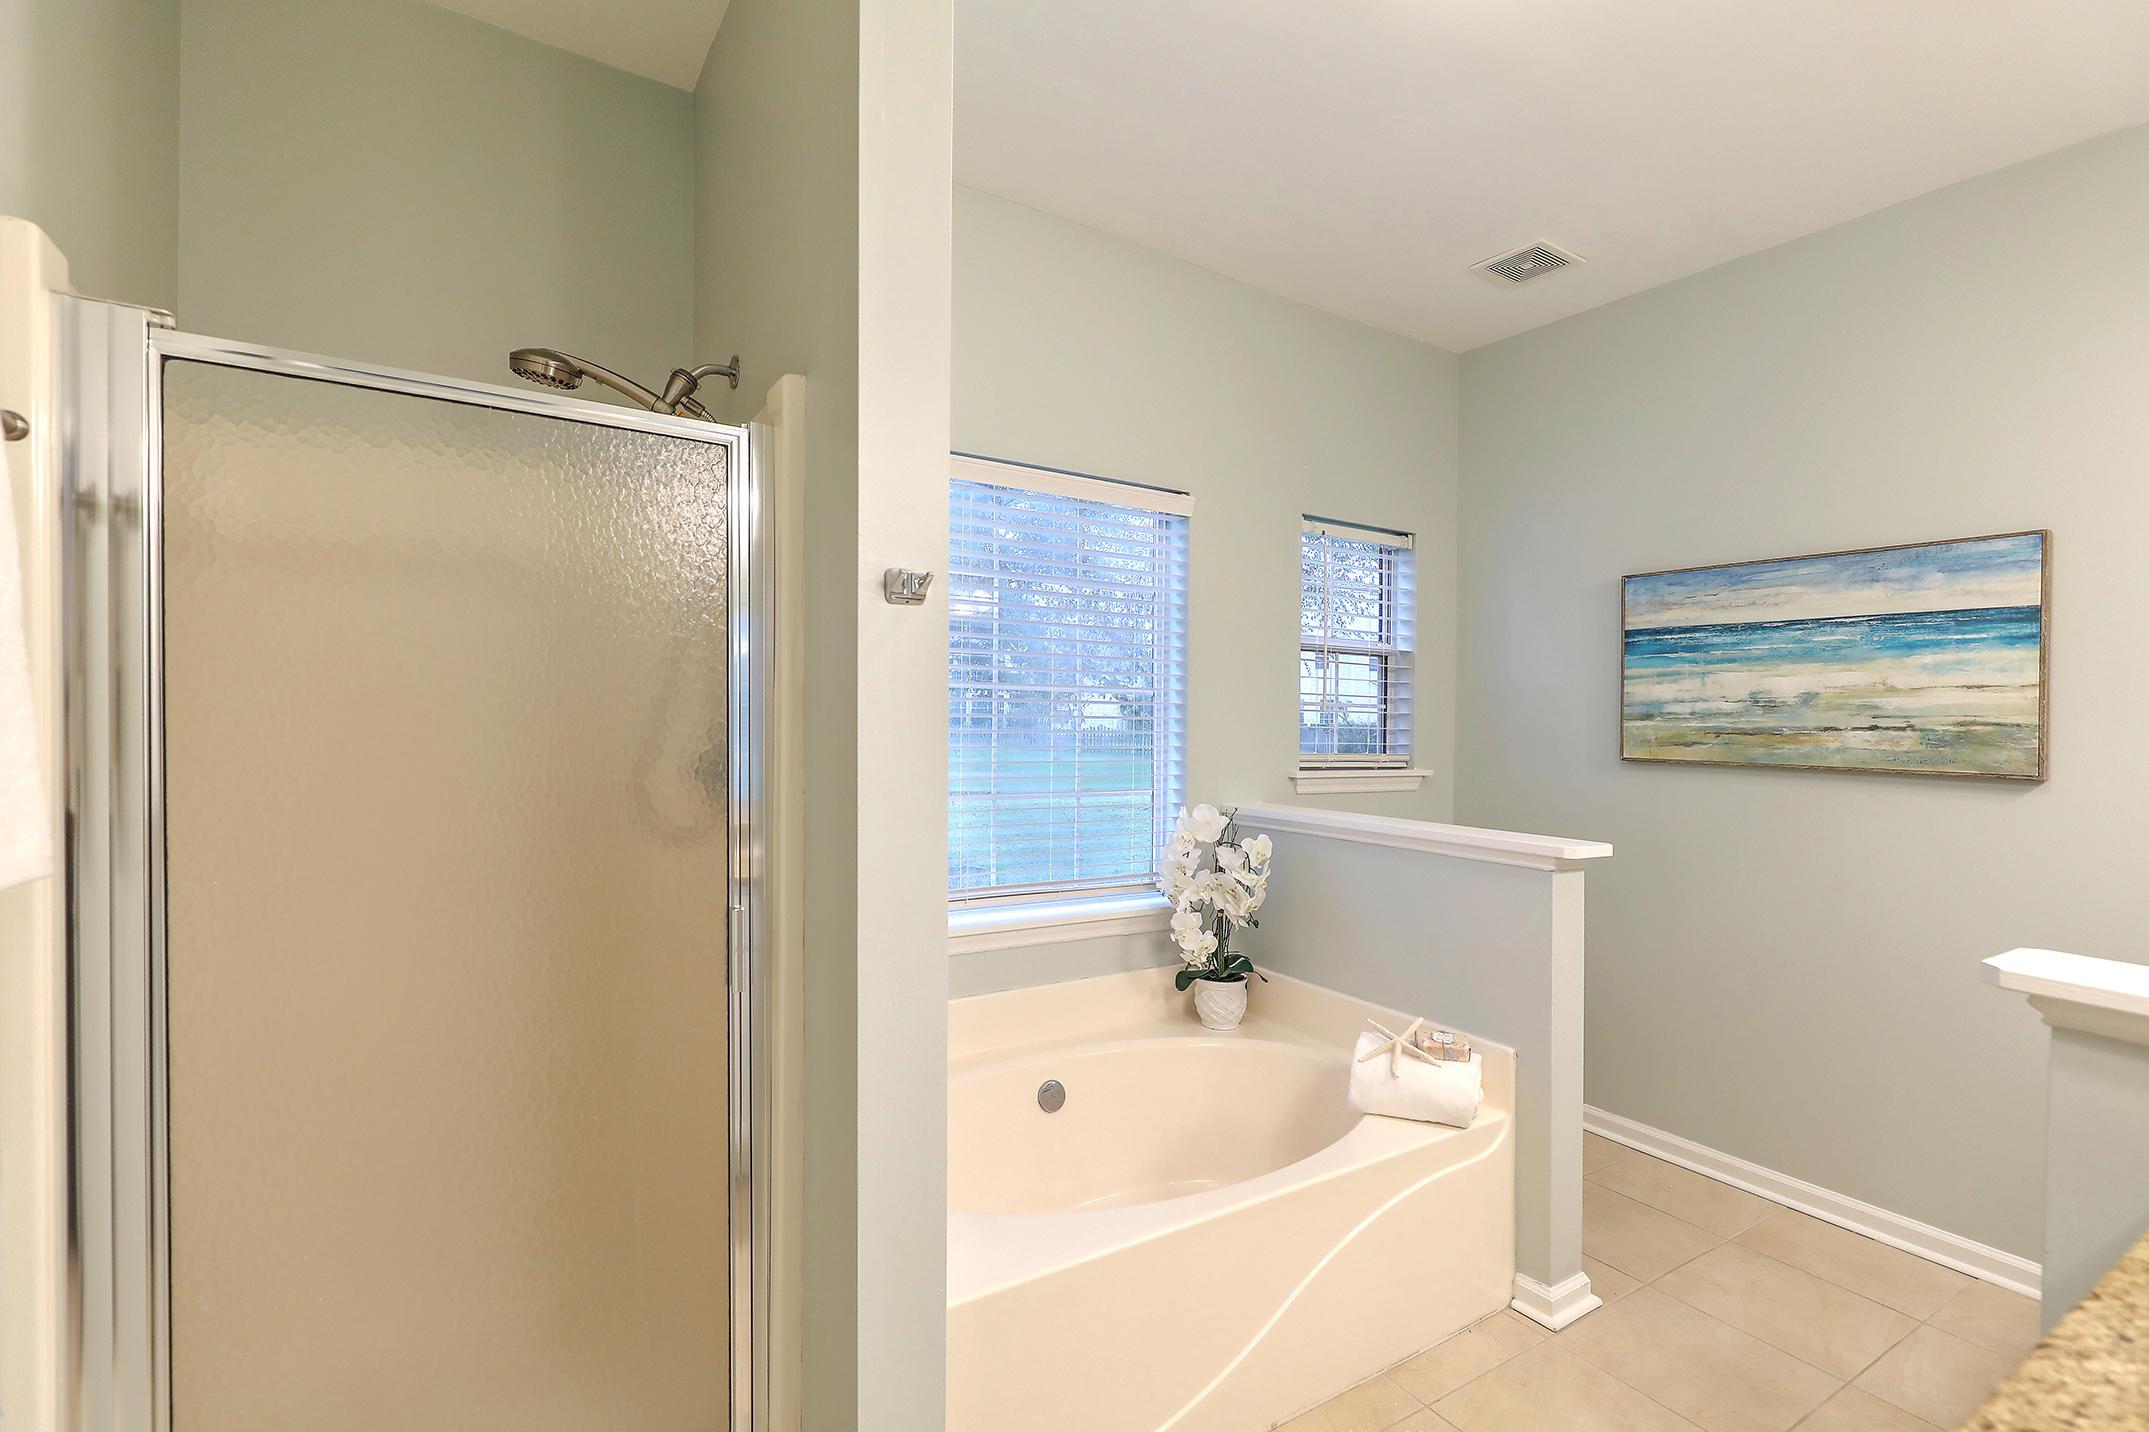 Dunes West Homes For Sale - 1309 Sassafrass, Mount Pleasant, SC - 22